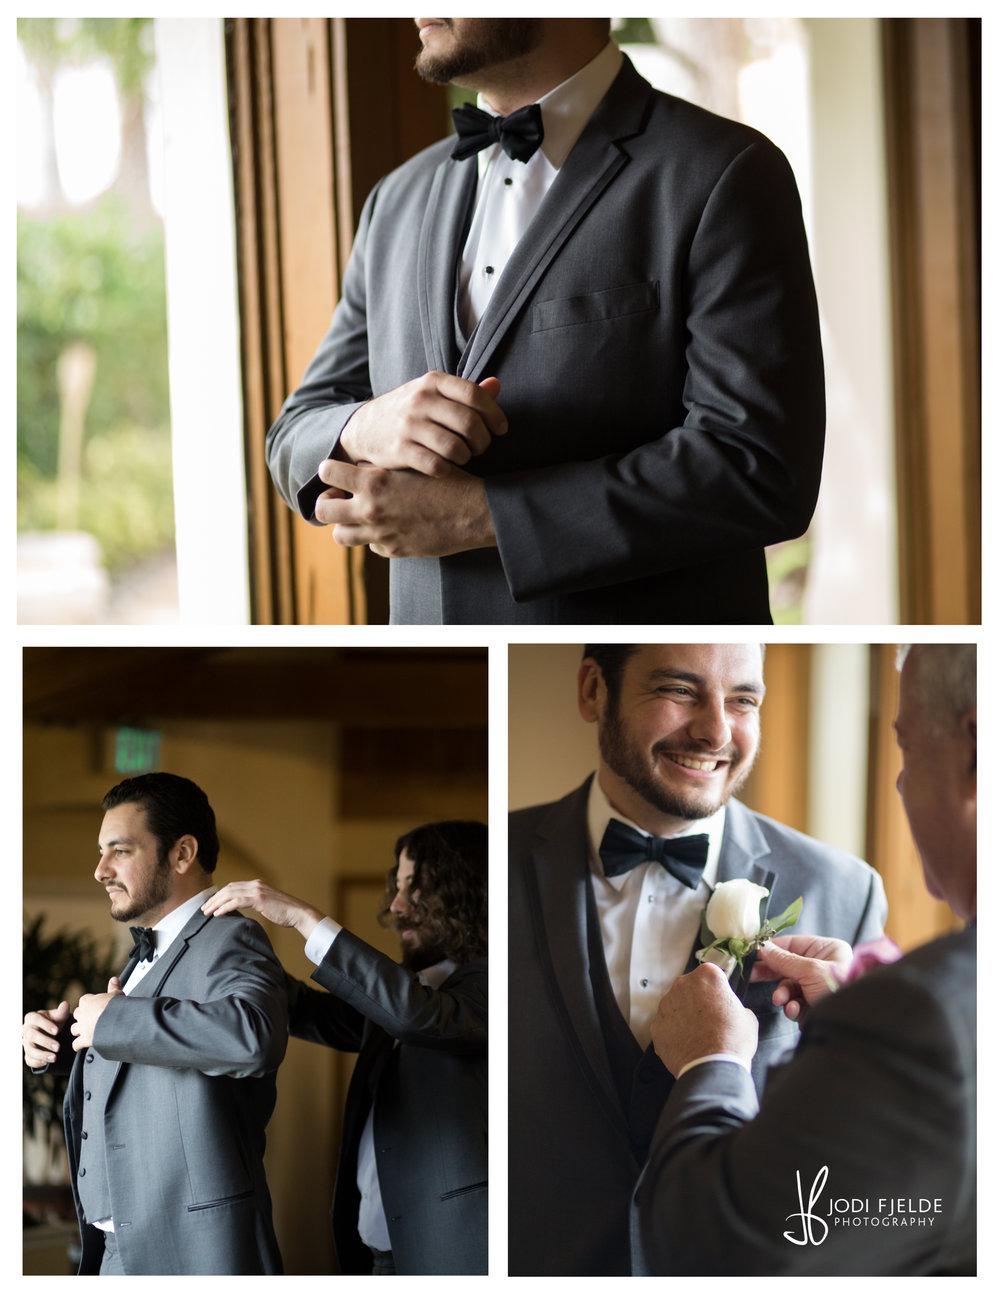 Boynton_Beach_Florida_ Benvenuto_Wedding_Heather__Doug_Married_4.jpg